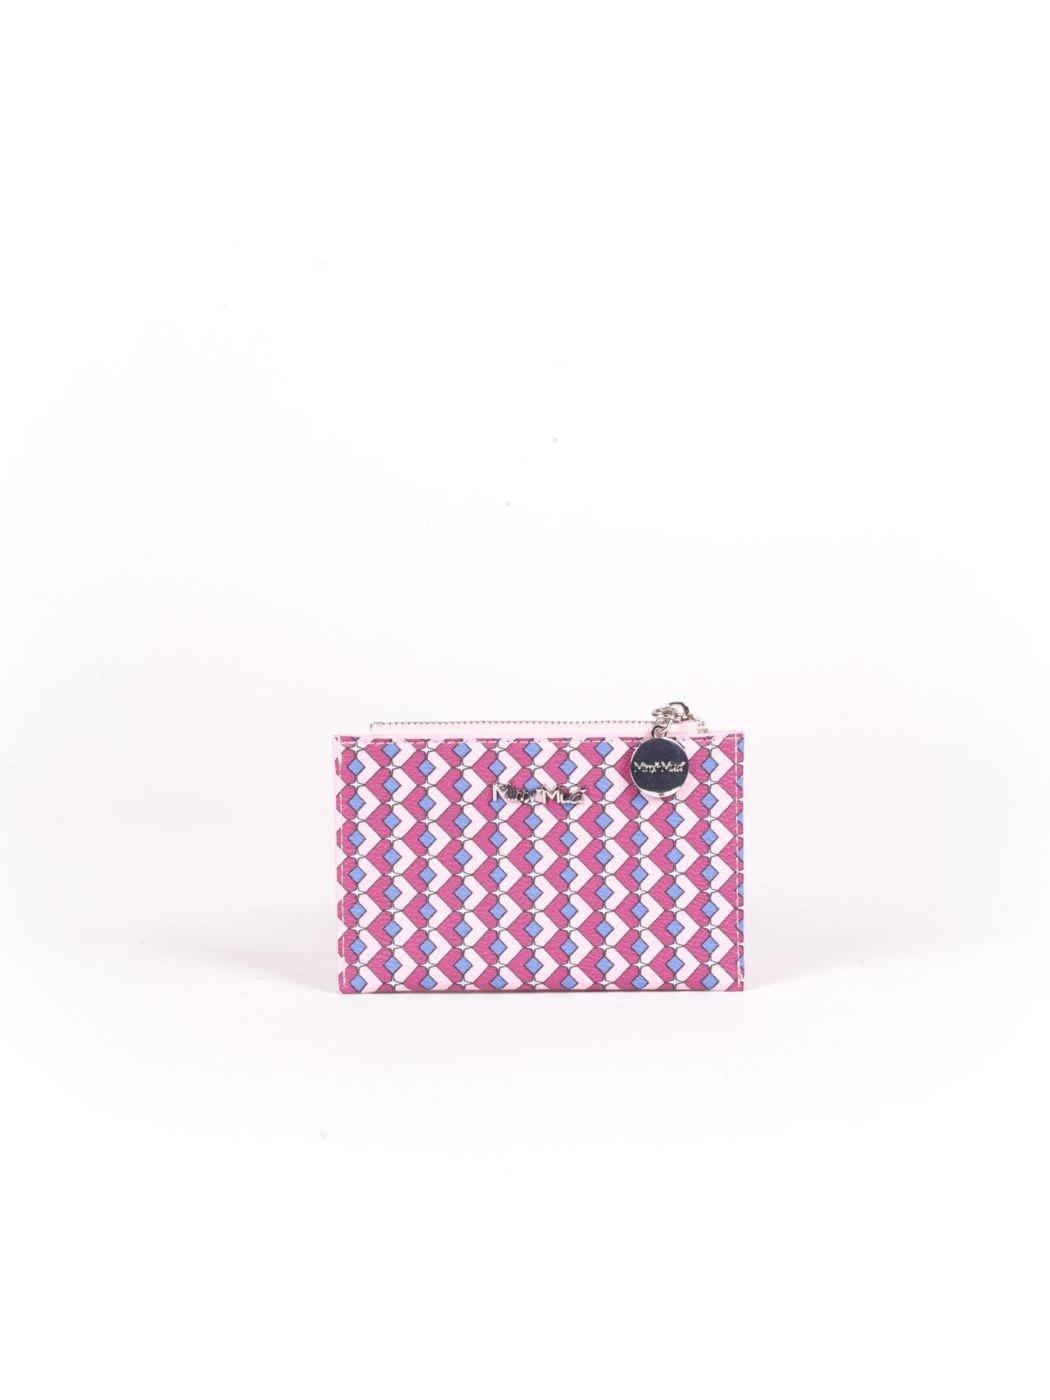 PURSE/CARD HOLDER